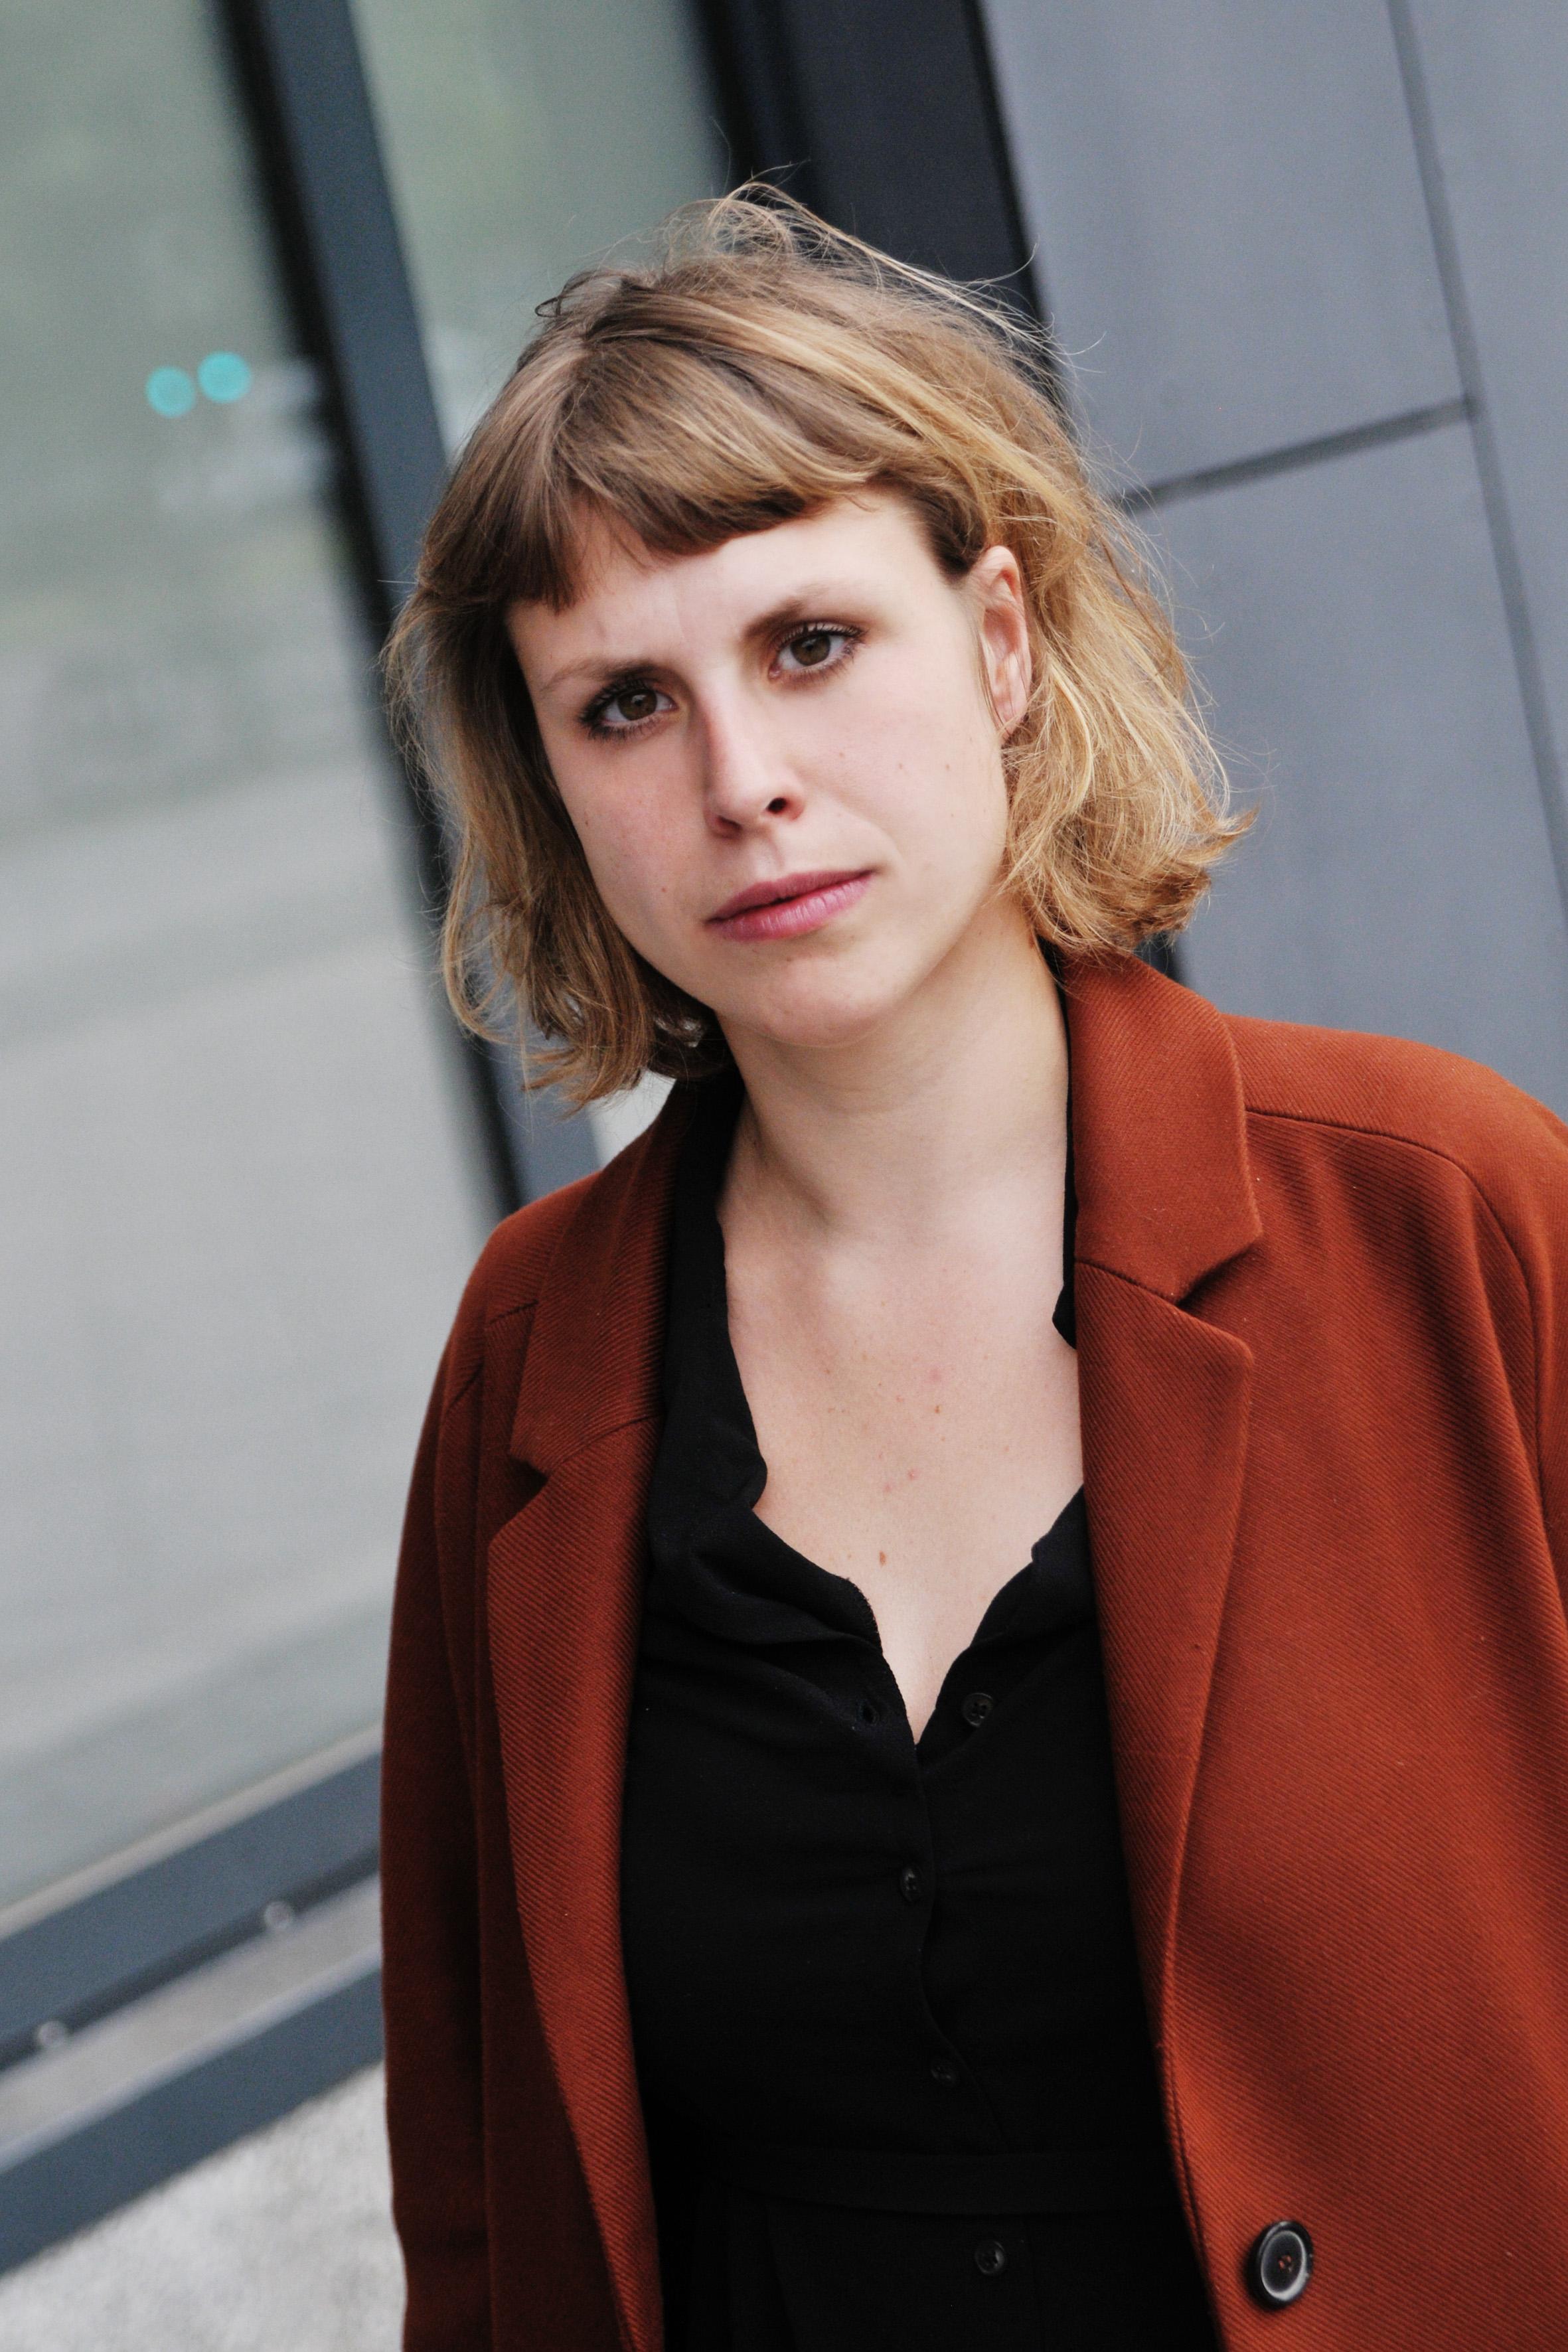 Johanna Wieking